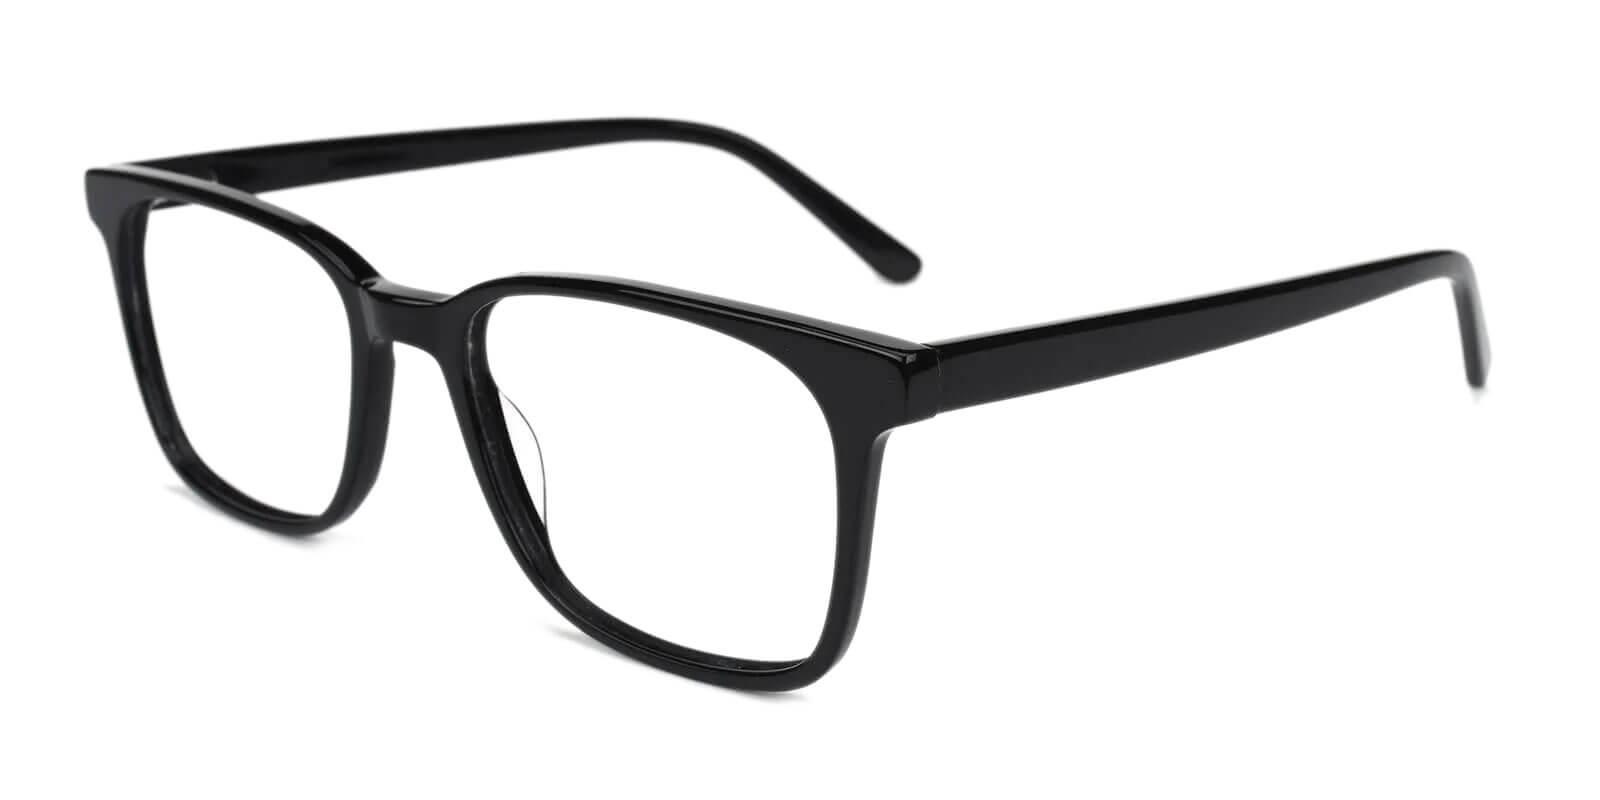 Reverb Black Acetate Eyeglasses , SpringHinges , UniversalBridgeFit Frames from ABBE Glasses